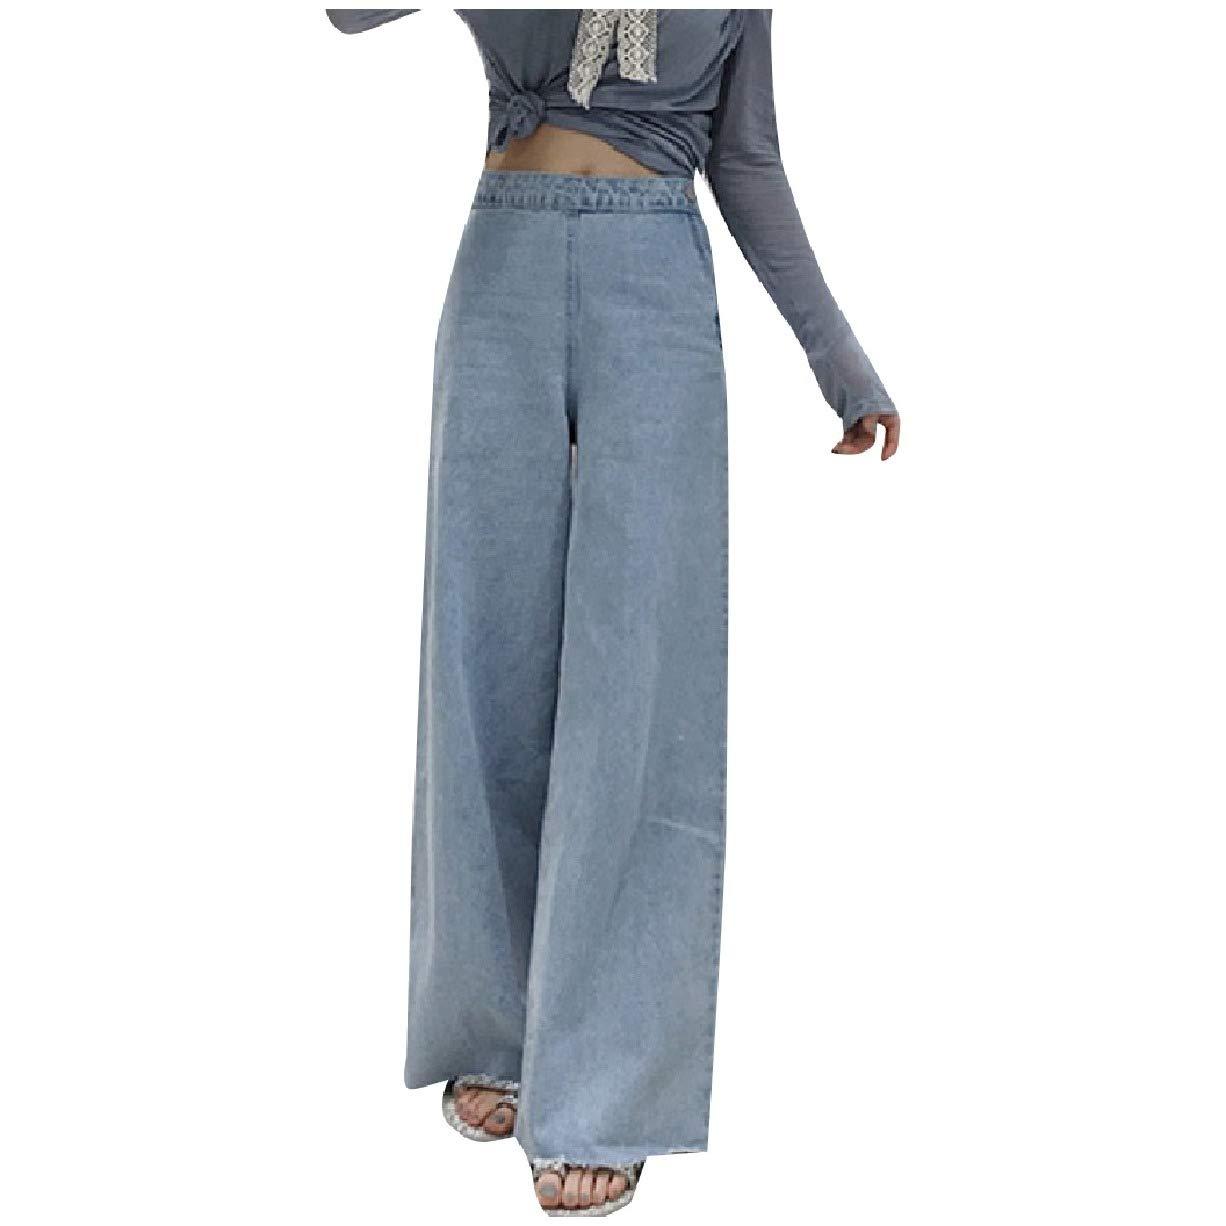 Vintage Dresses Australia- 20s, 30s, 40s, 50s, 60s, 70s MogogoWomen Highwaist Retro Style Bell Bottom Denim Pants Washed Jeans  AT vintagedancer.com